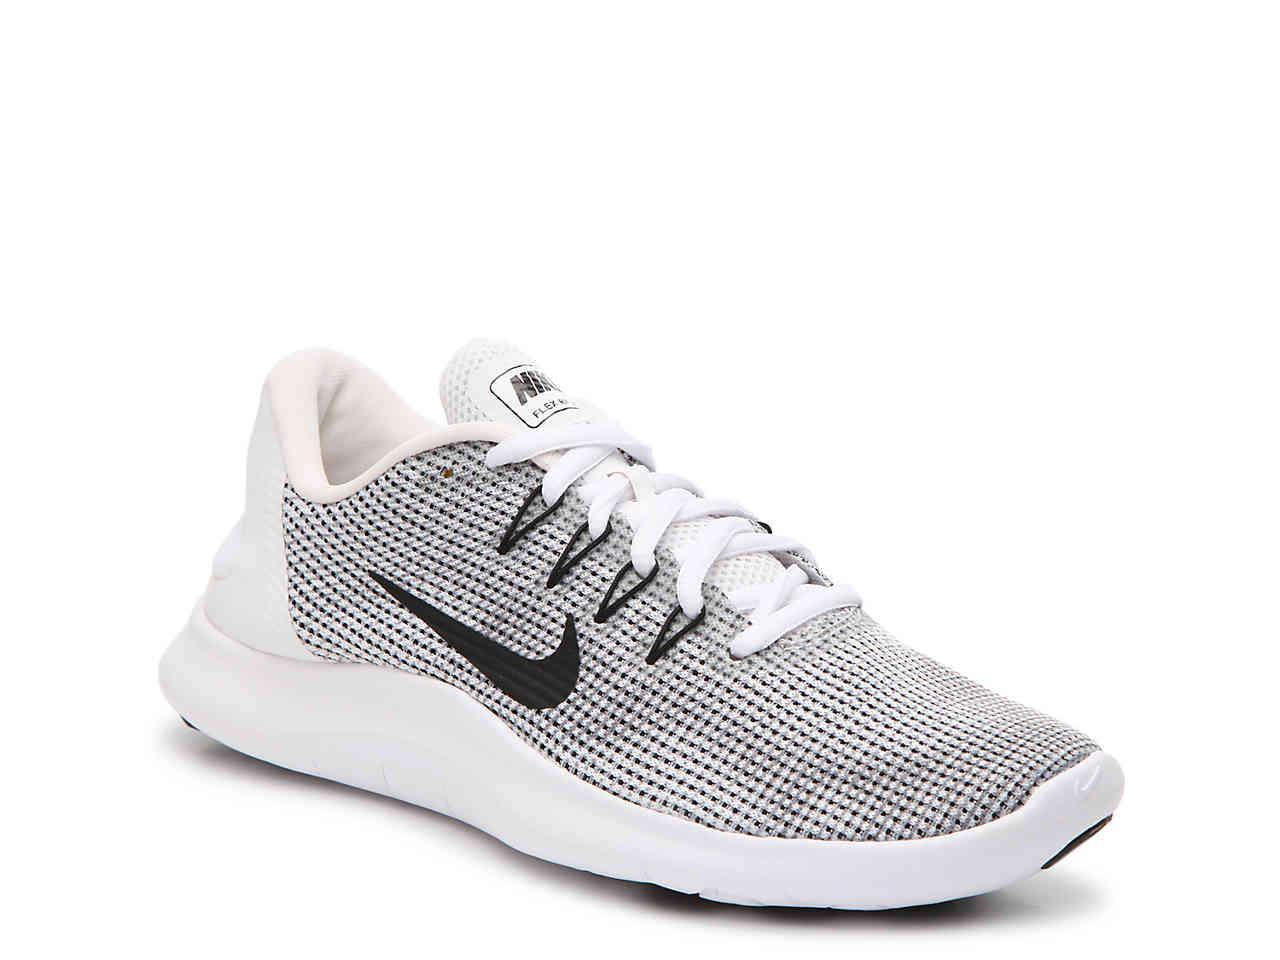 fcc239d86a68 Lyst - Nike Flex 18 Rn Lightweight Running Shoe in White